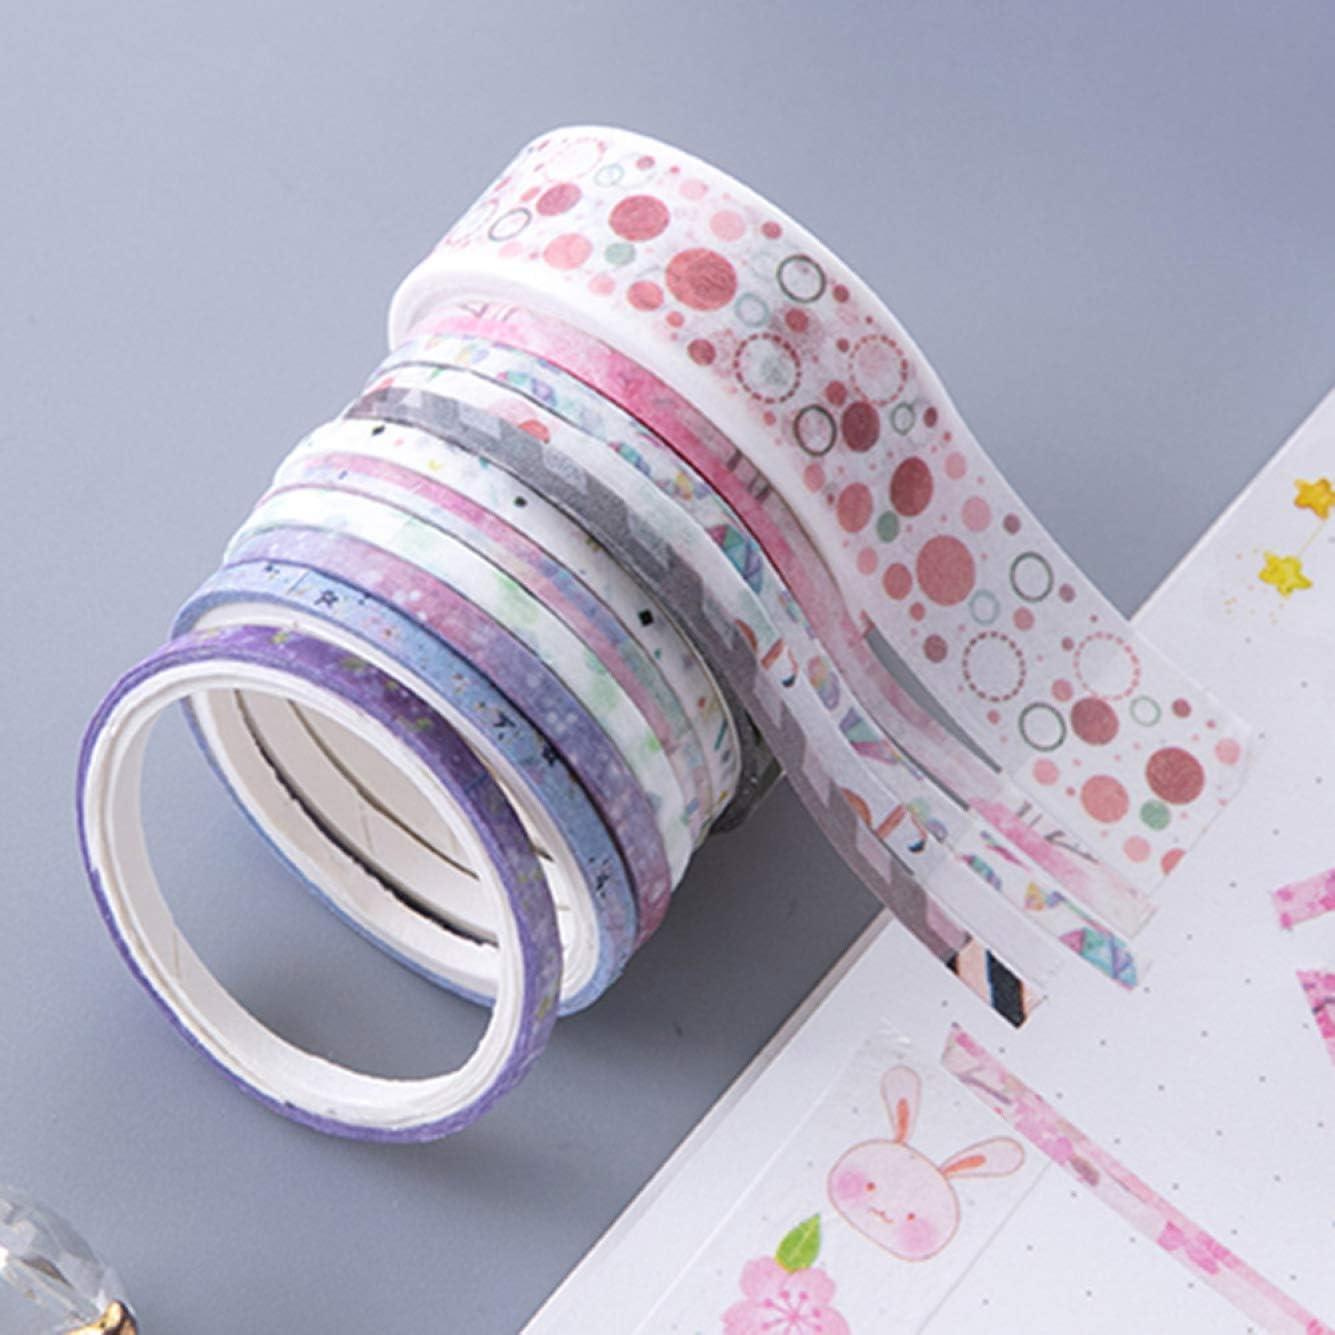 None Size 100卷细袋装72689 kula Excellent 100 Rolls Washi Tape Set Foil Gold Skinny Decorative Masking Washi Tapes 1-5Mm Wide DIY Masking Tape